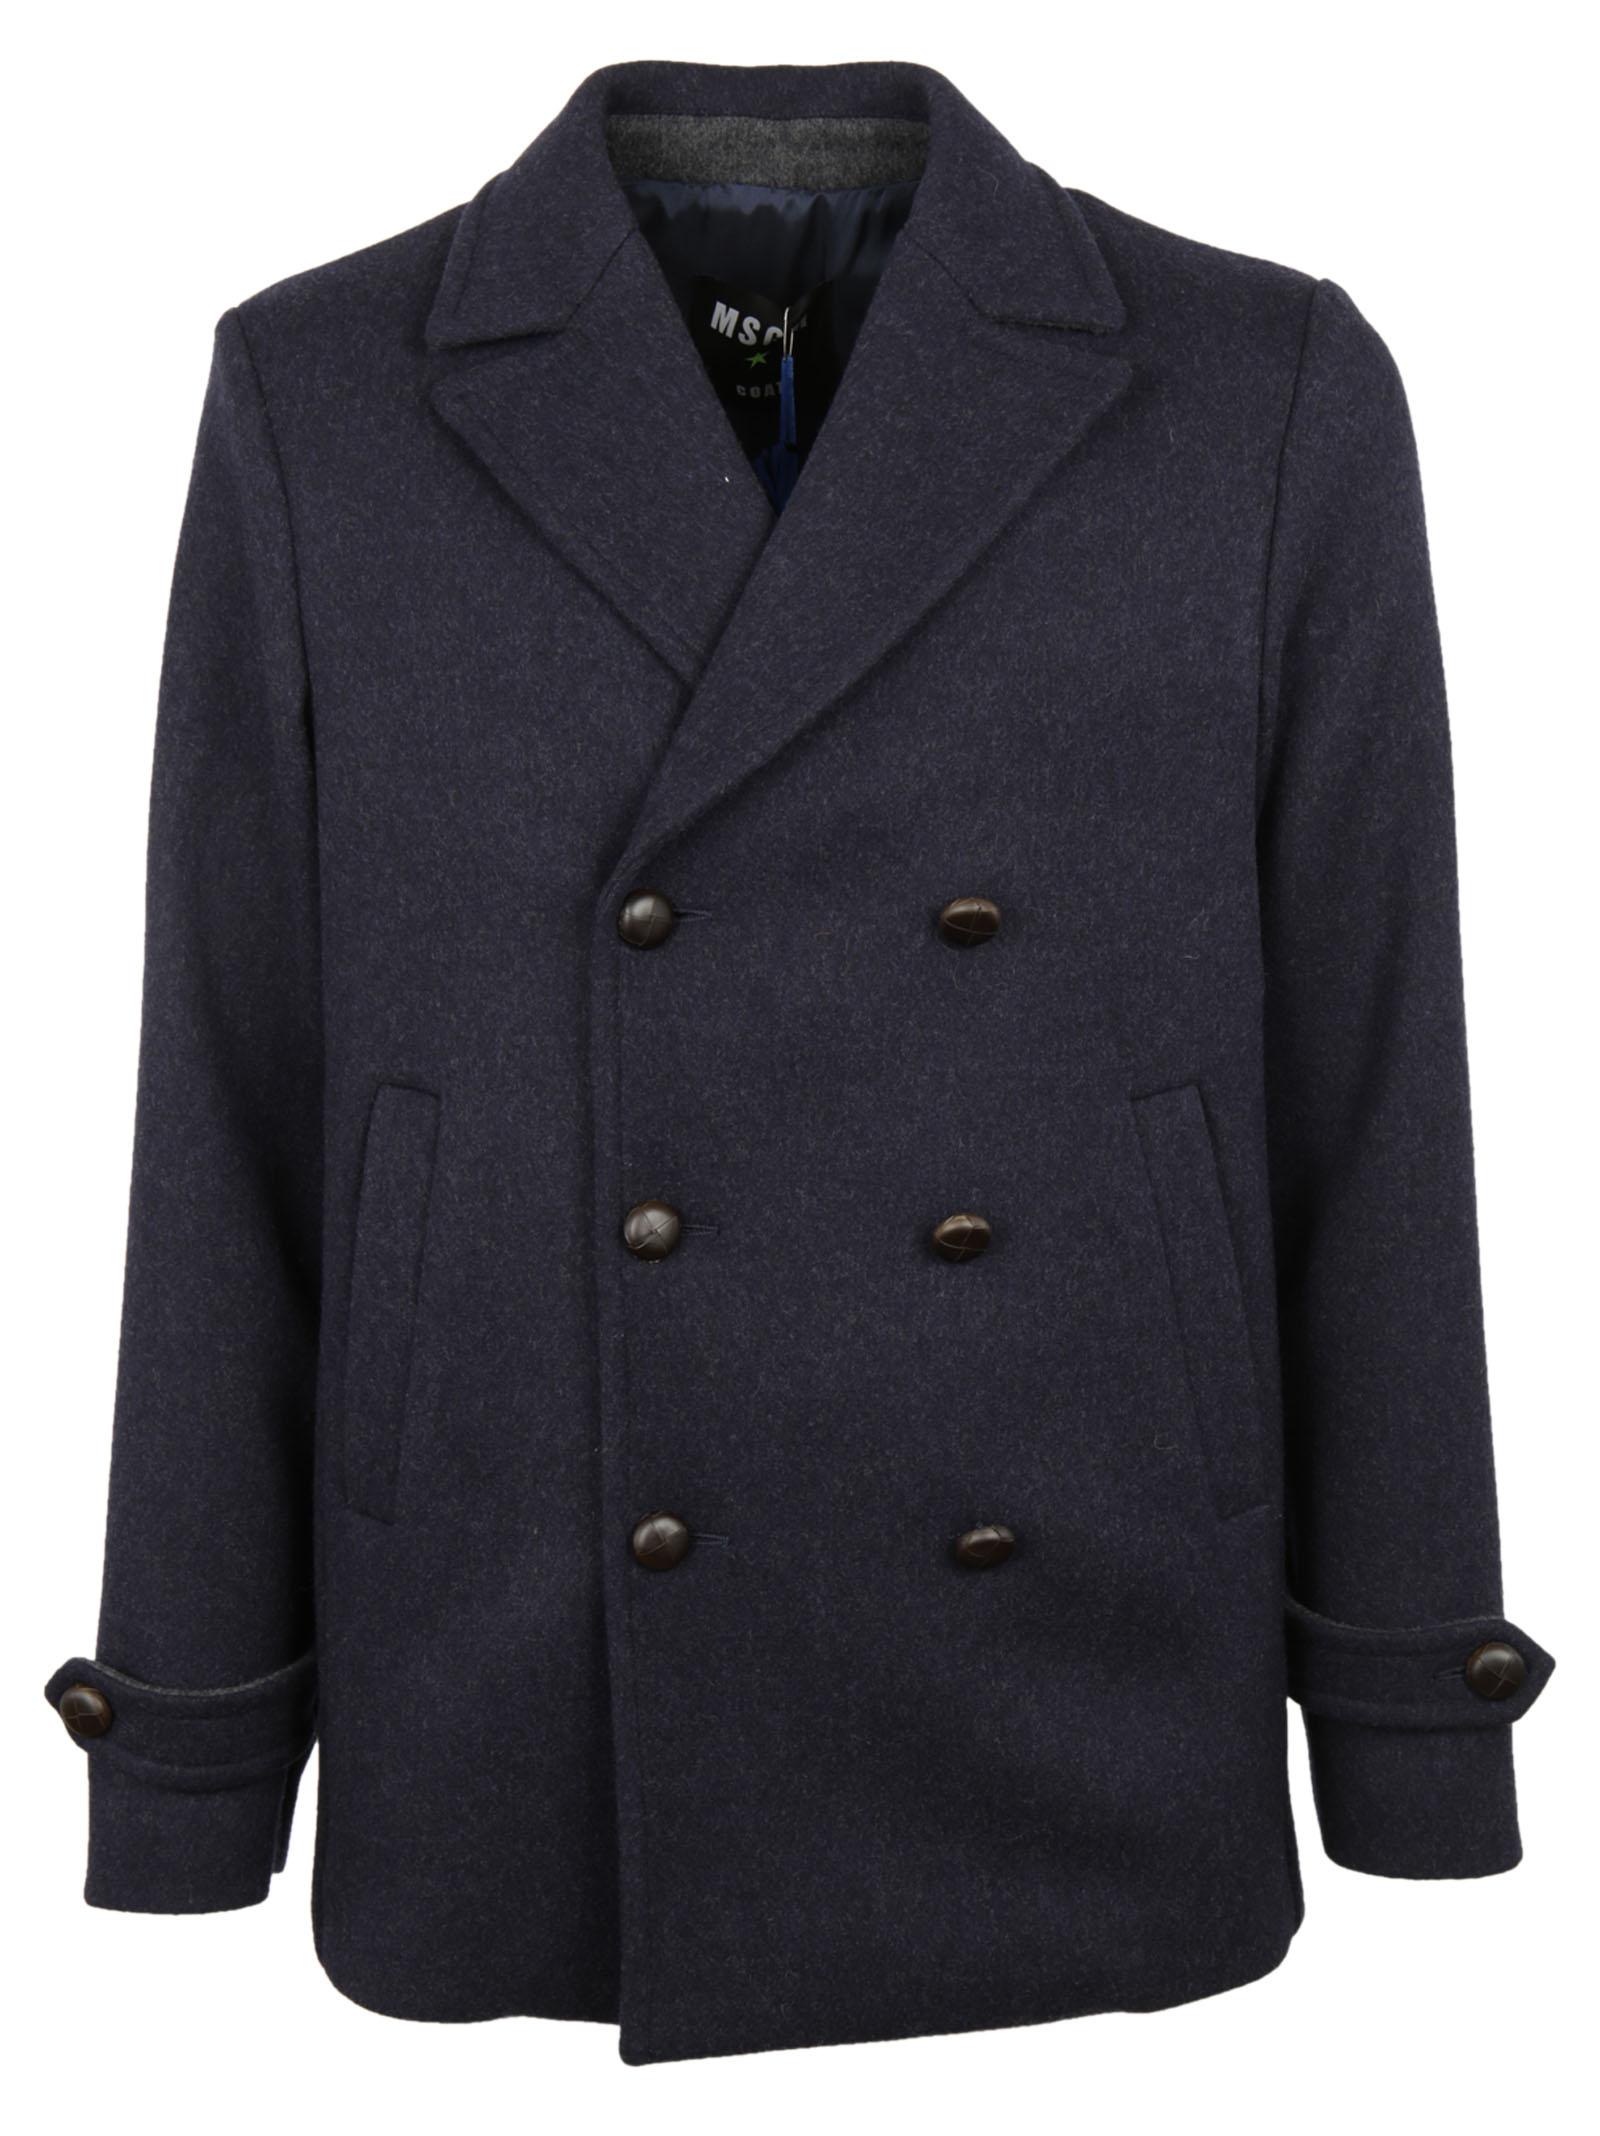 MSGM MSGM Double Breasted Pea Coat